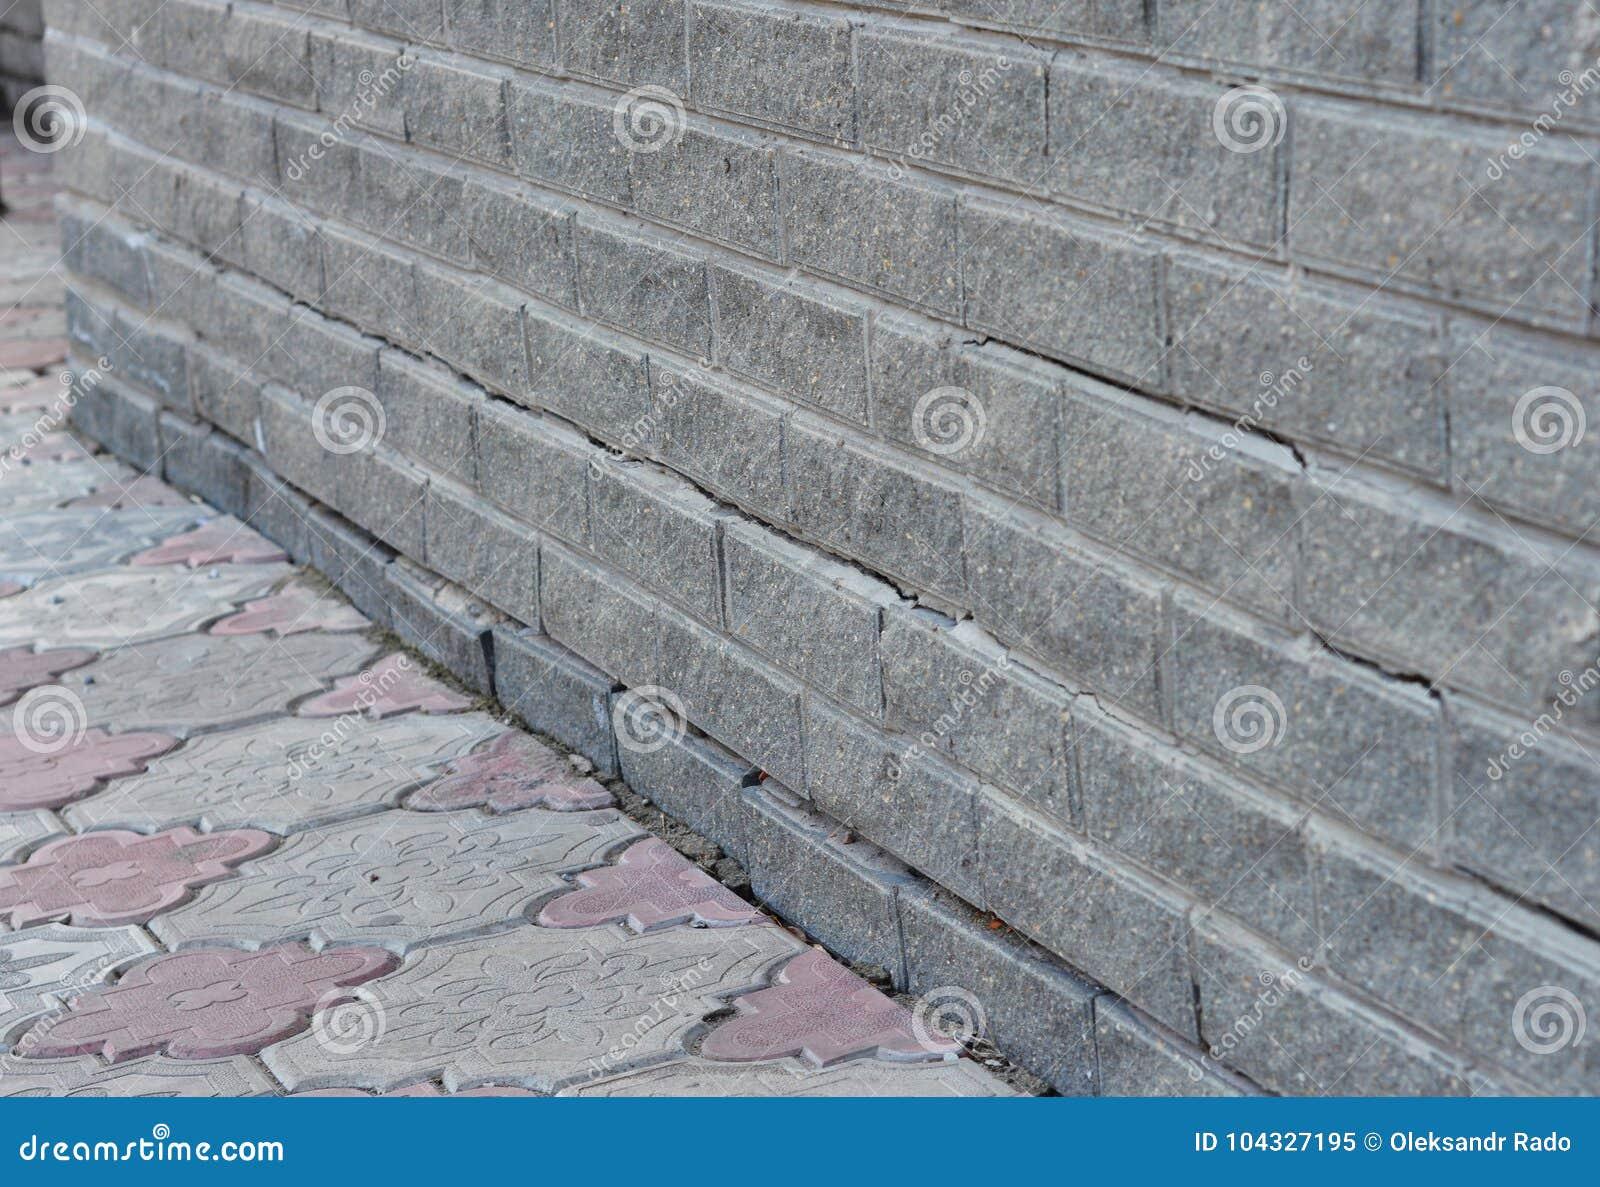 repair crack in foundation wall